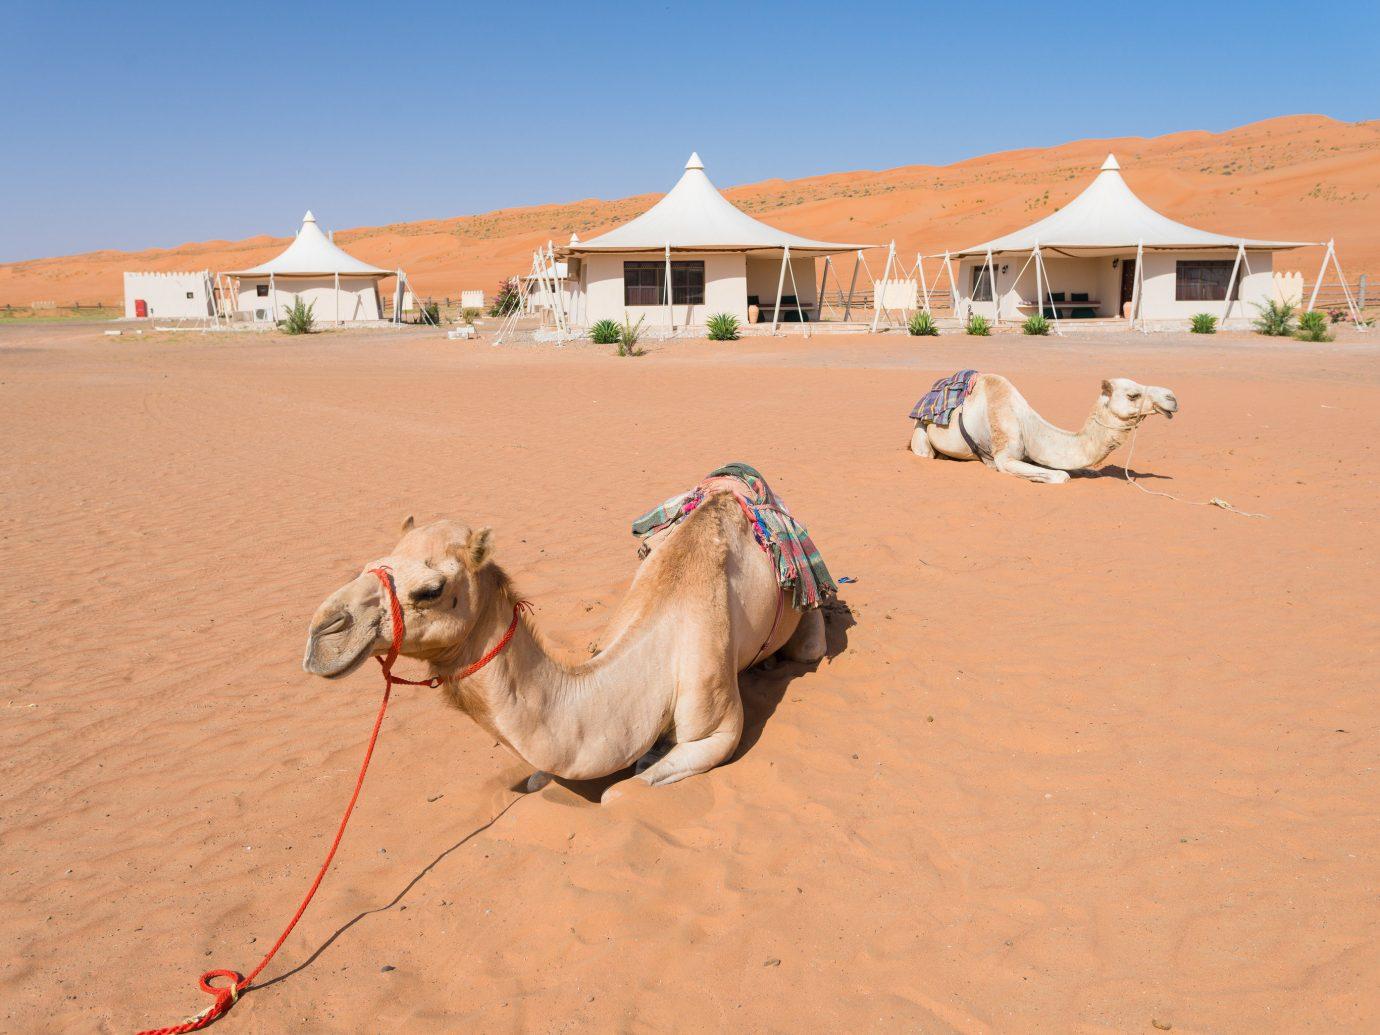 Trip Ideas Camel arabian camel sand camel like mammal erg dune Desert sahara aeolian landform vacation sky landscape ecoregion singing sand